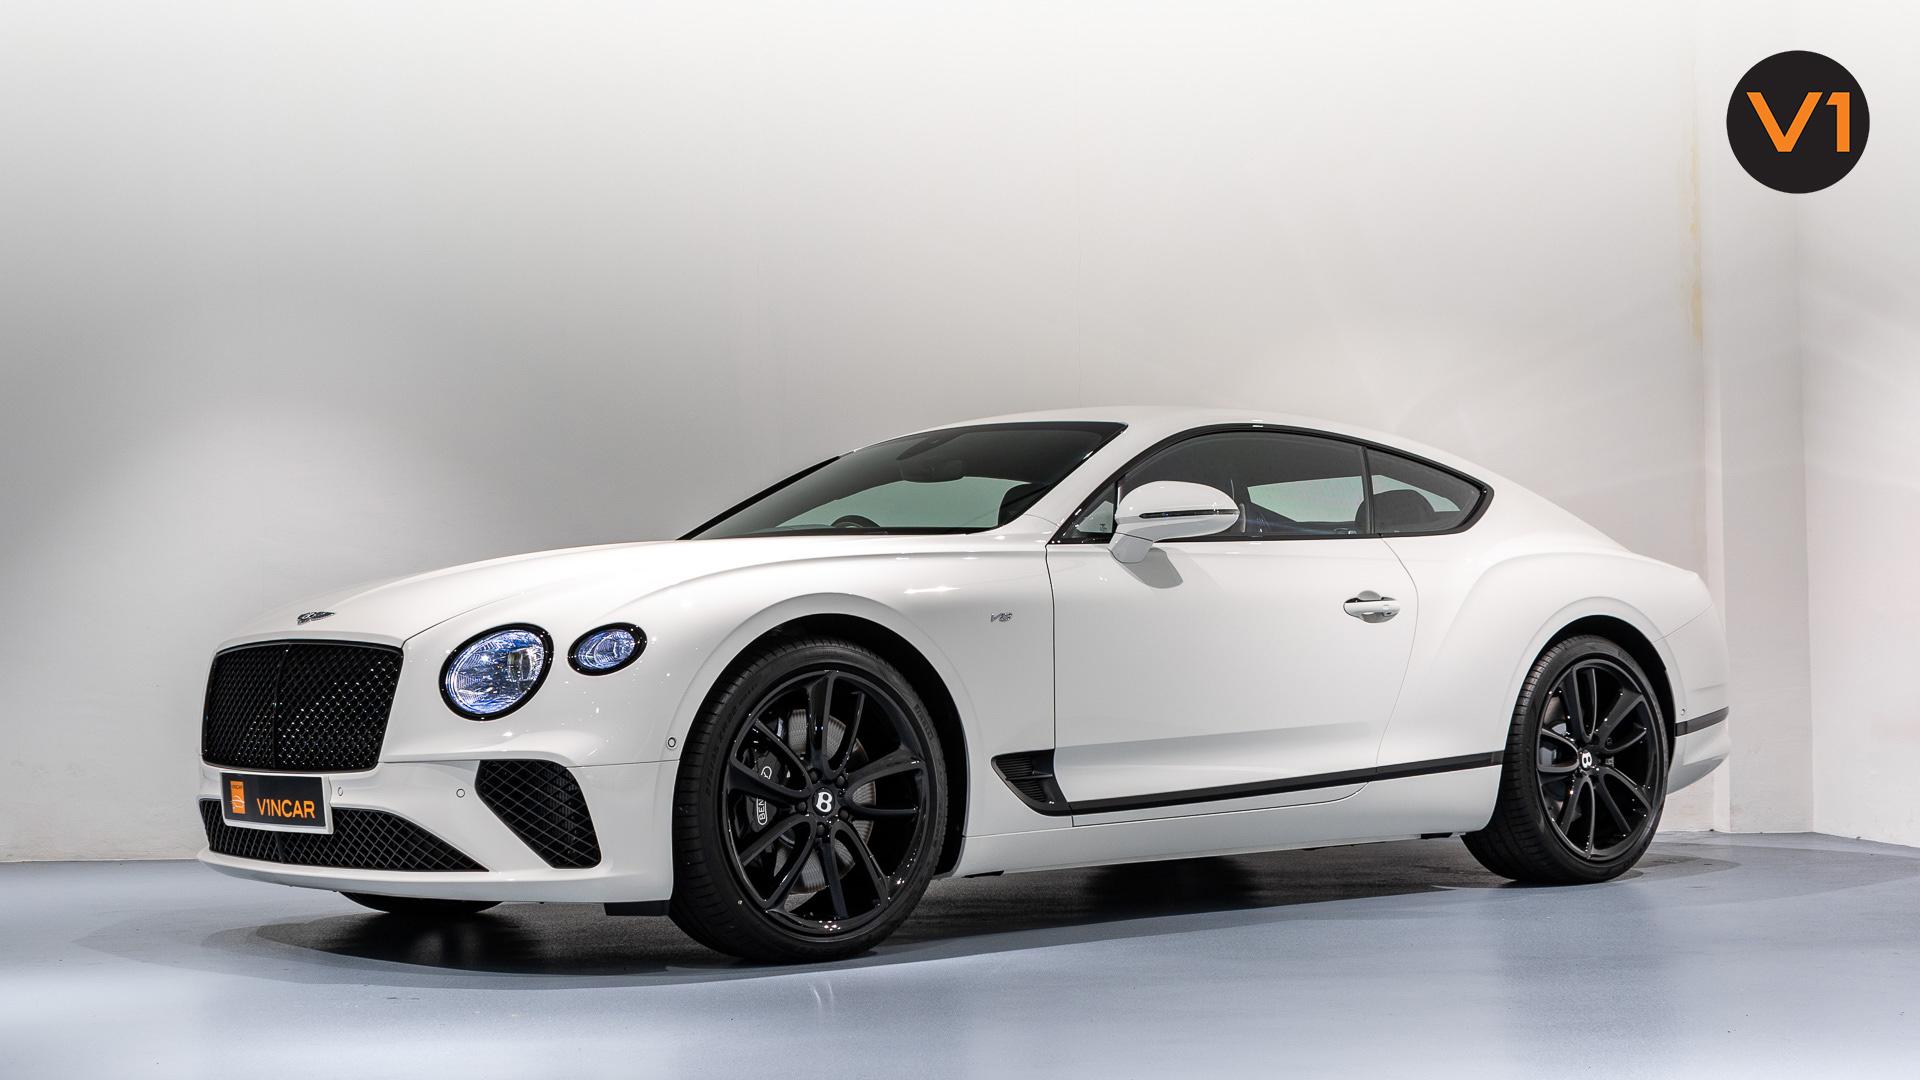 Bentley Continental GT Coupe V8 (Glacier White) - Side Profile